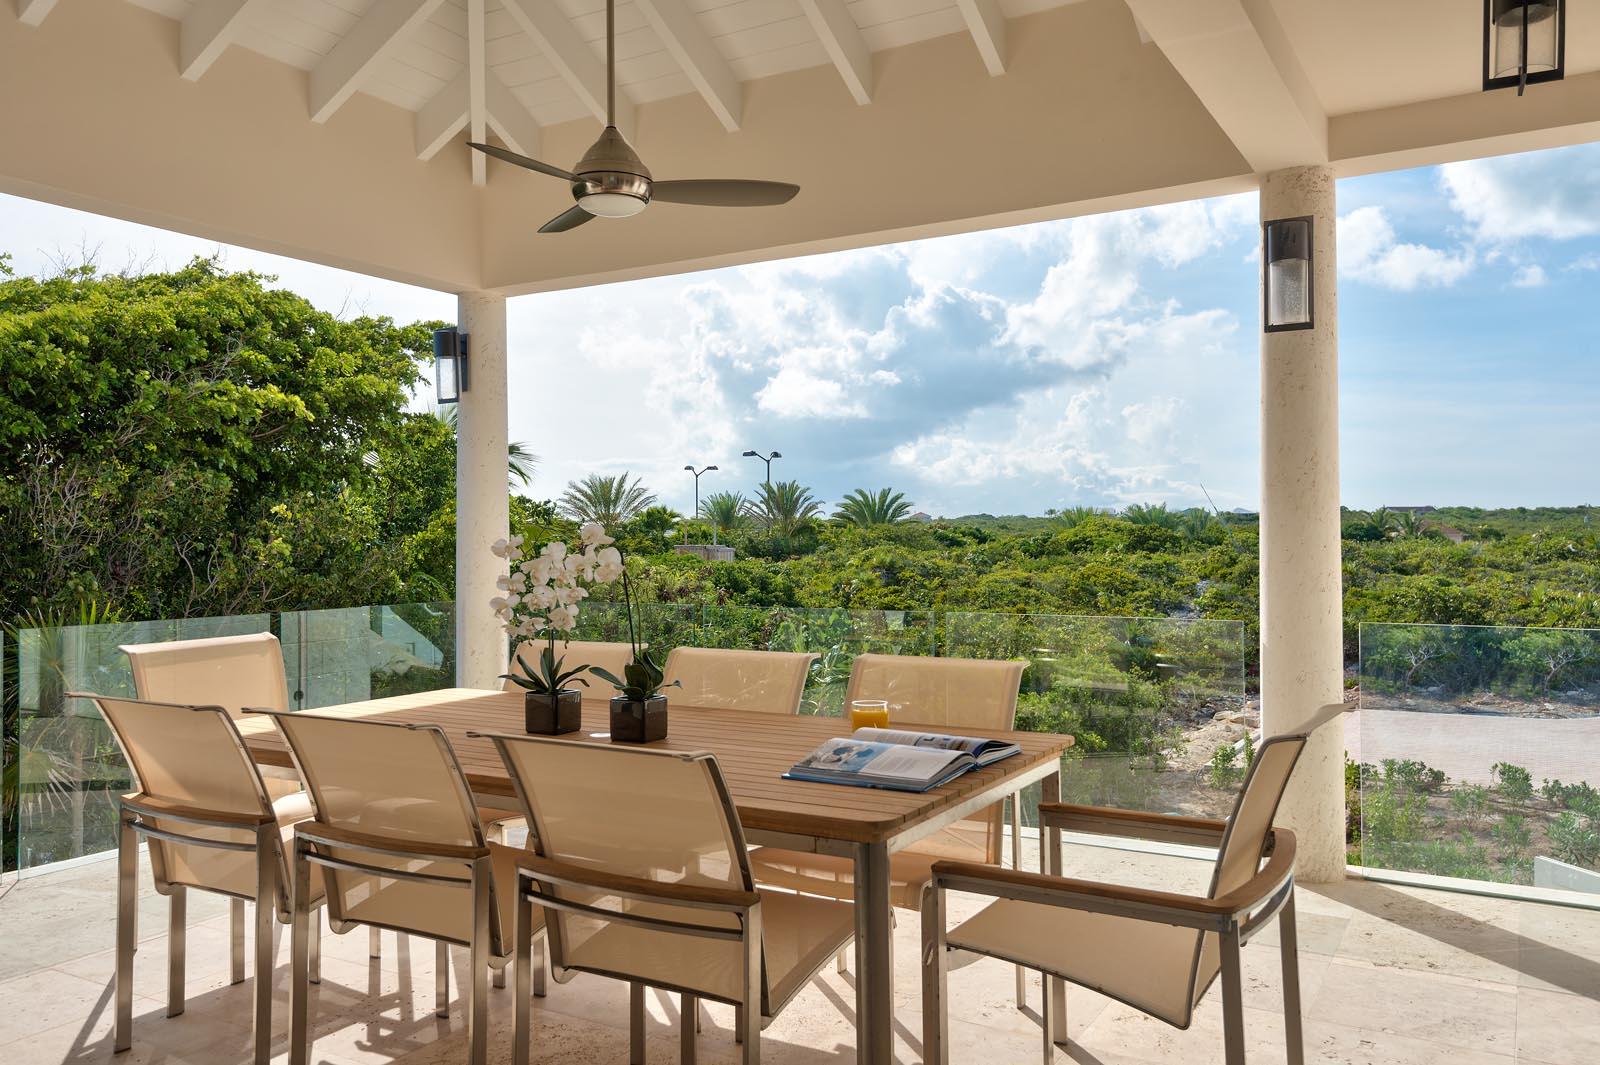 The outdoor dining area of Villa Isla, Long Bay Beach, Providenciales (Provo), Turks and Caicos Islands